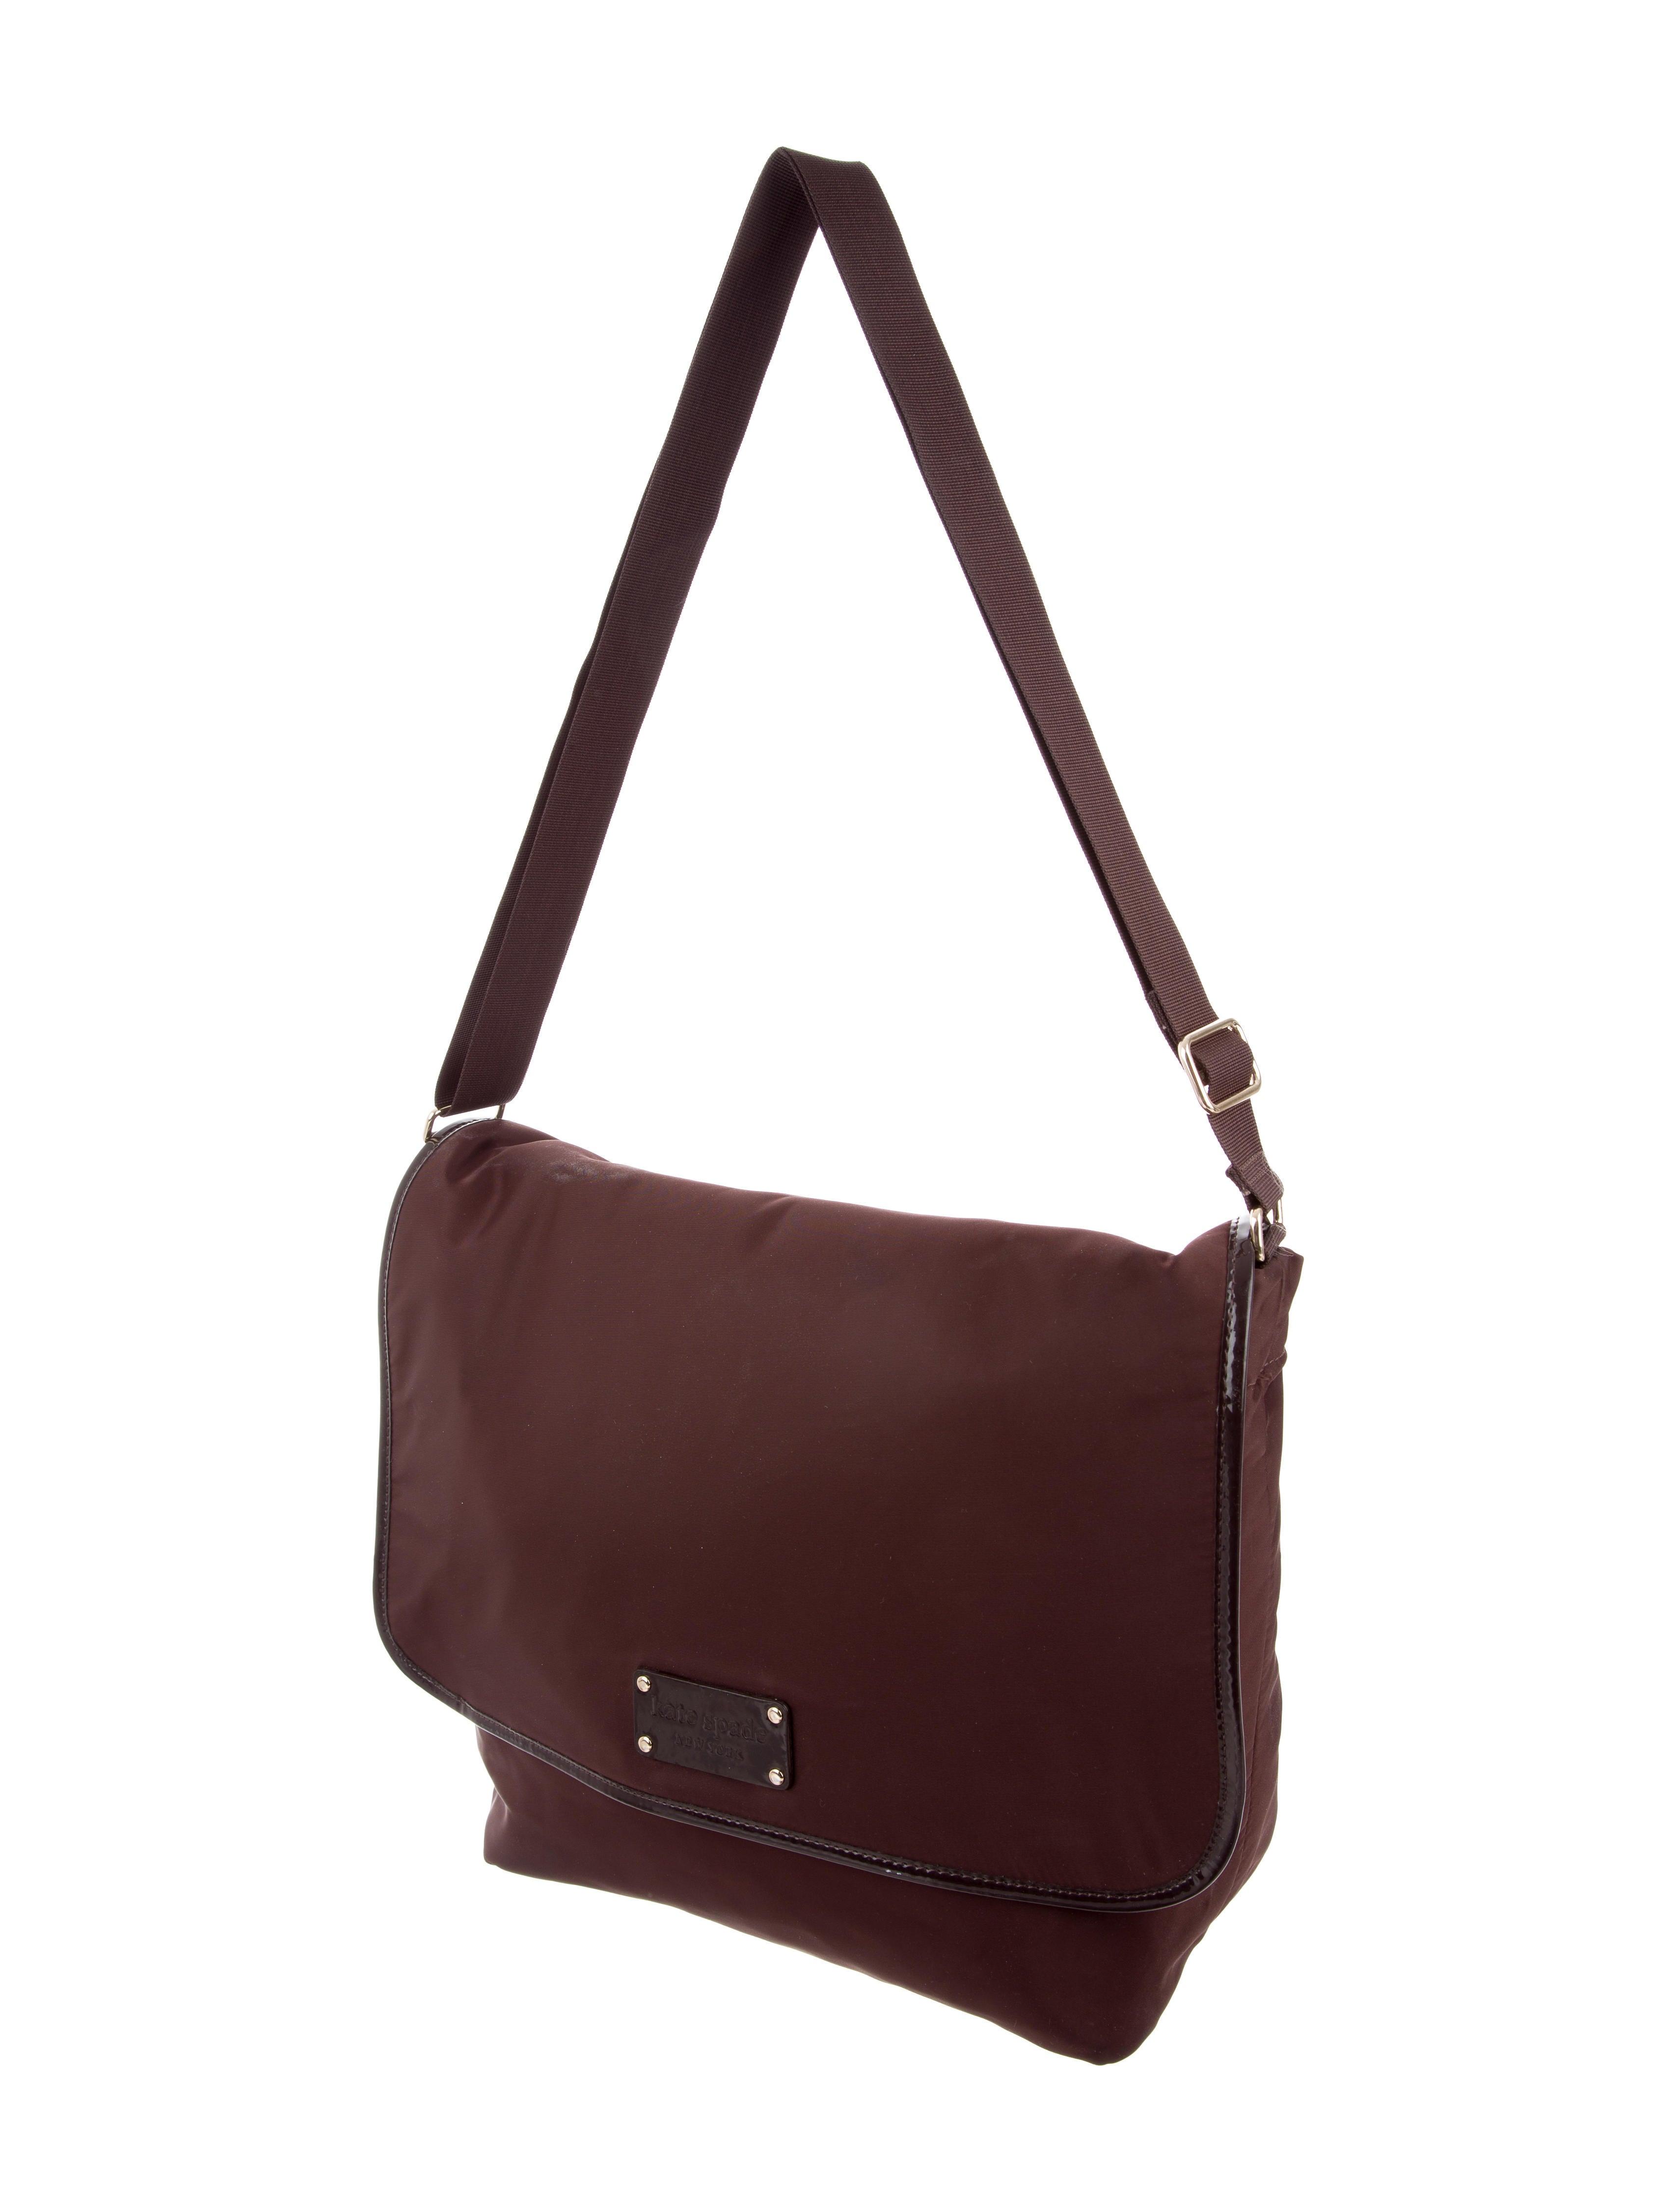 kate spade new york nylon messenger diaper bag handbags wka71123 the realreal. Black Bedroom Furniture Sets. Home Design Ideas